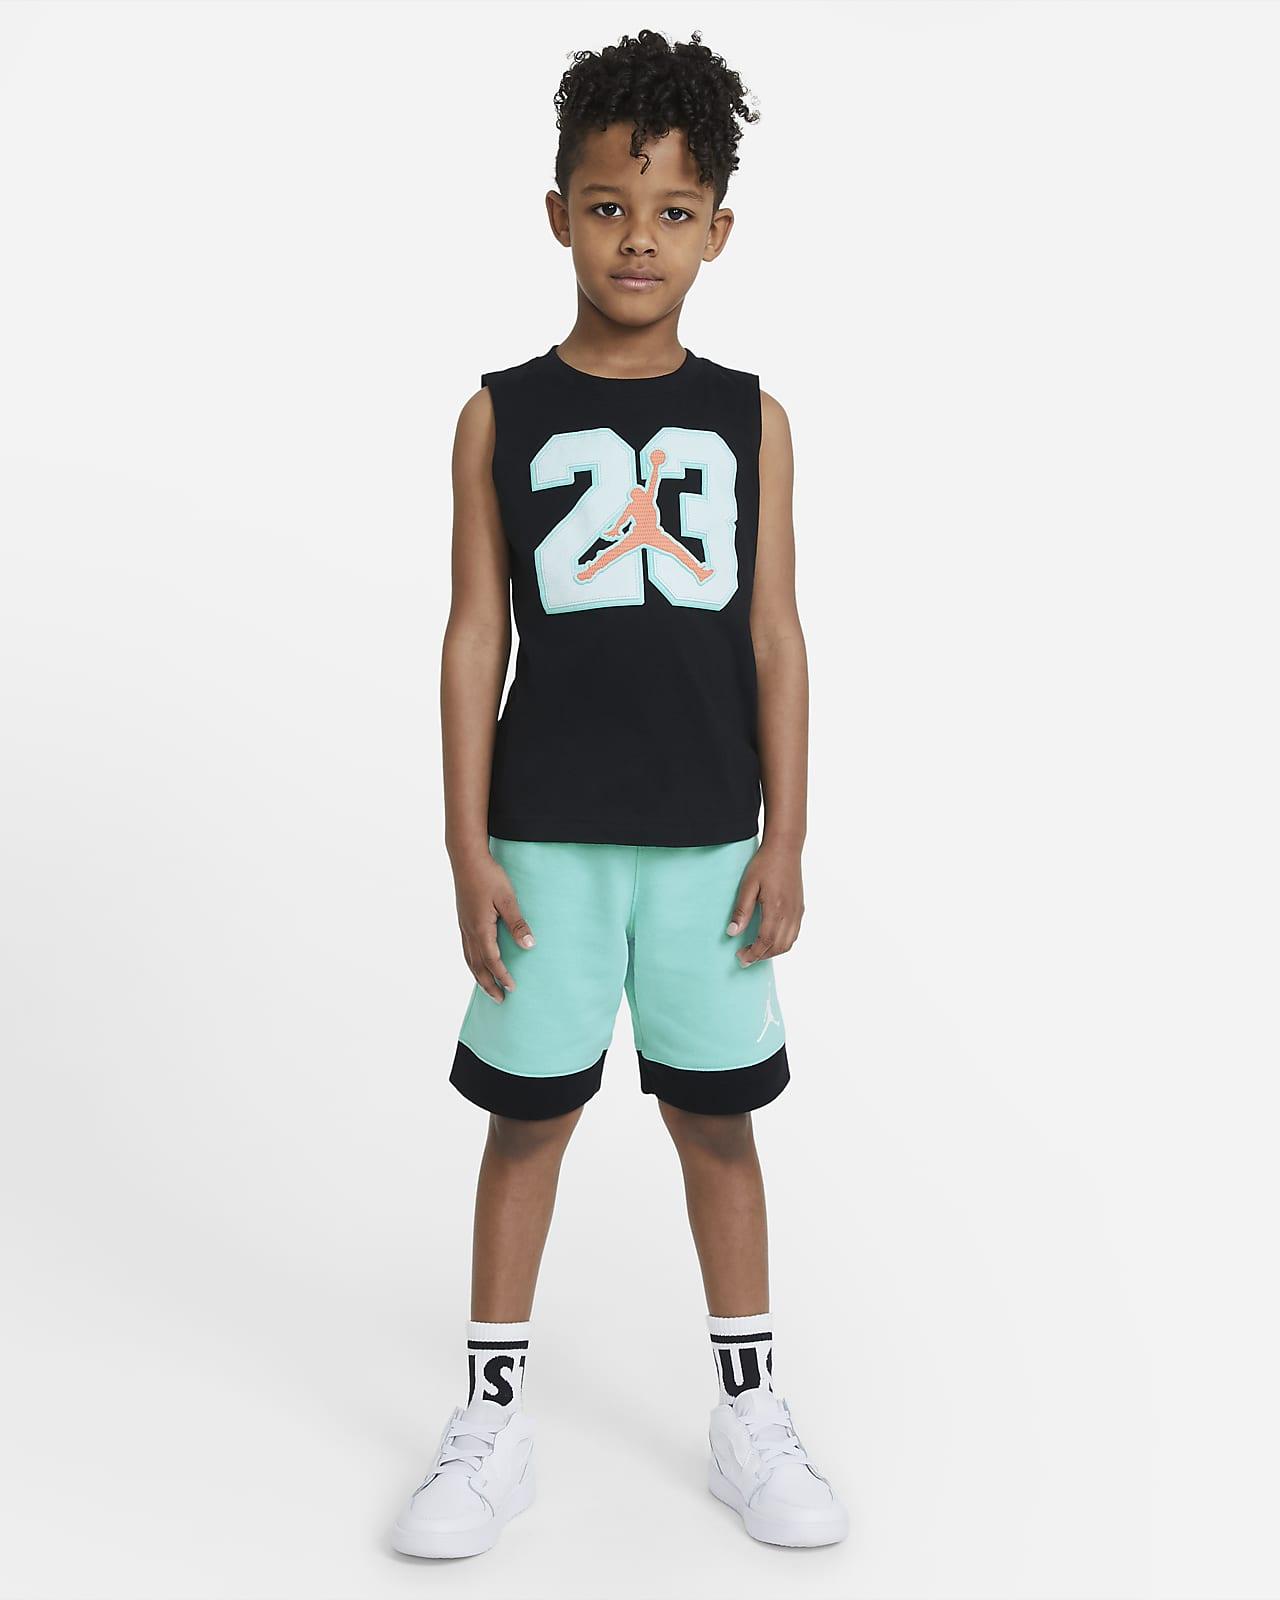 Jordan Little Kids' Tank Top and Shorts Set